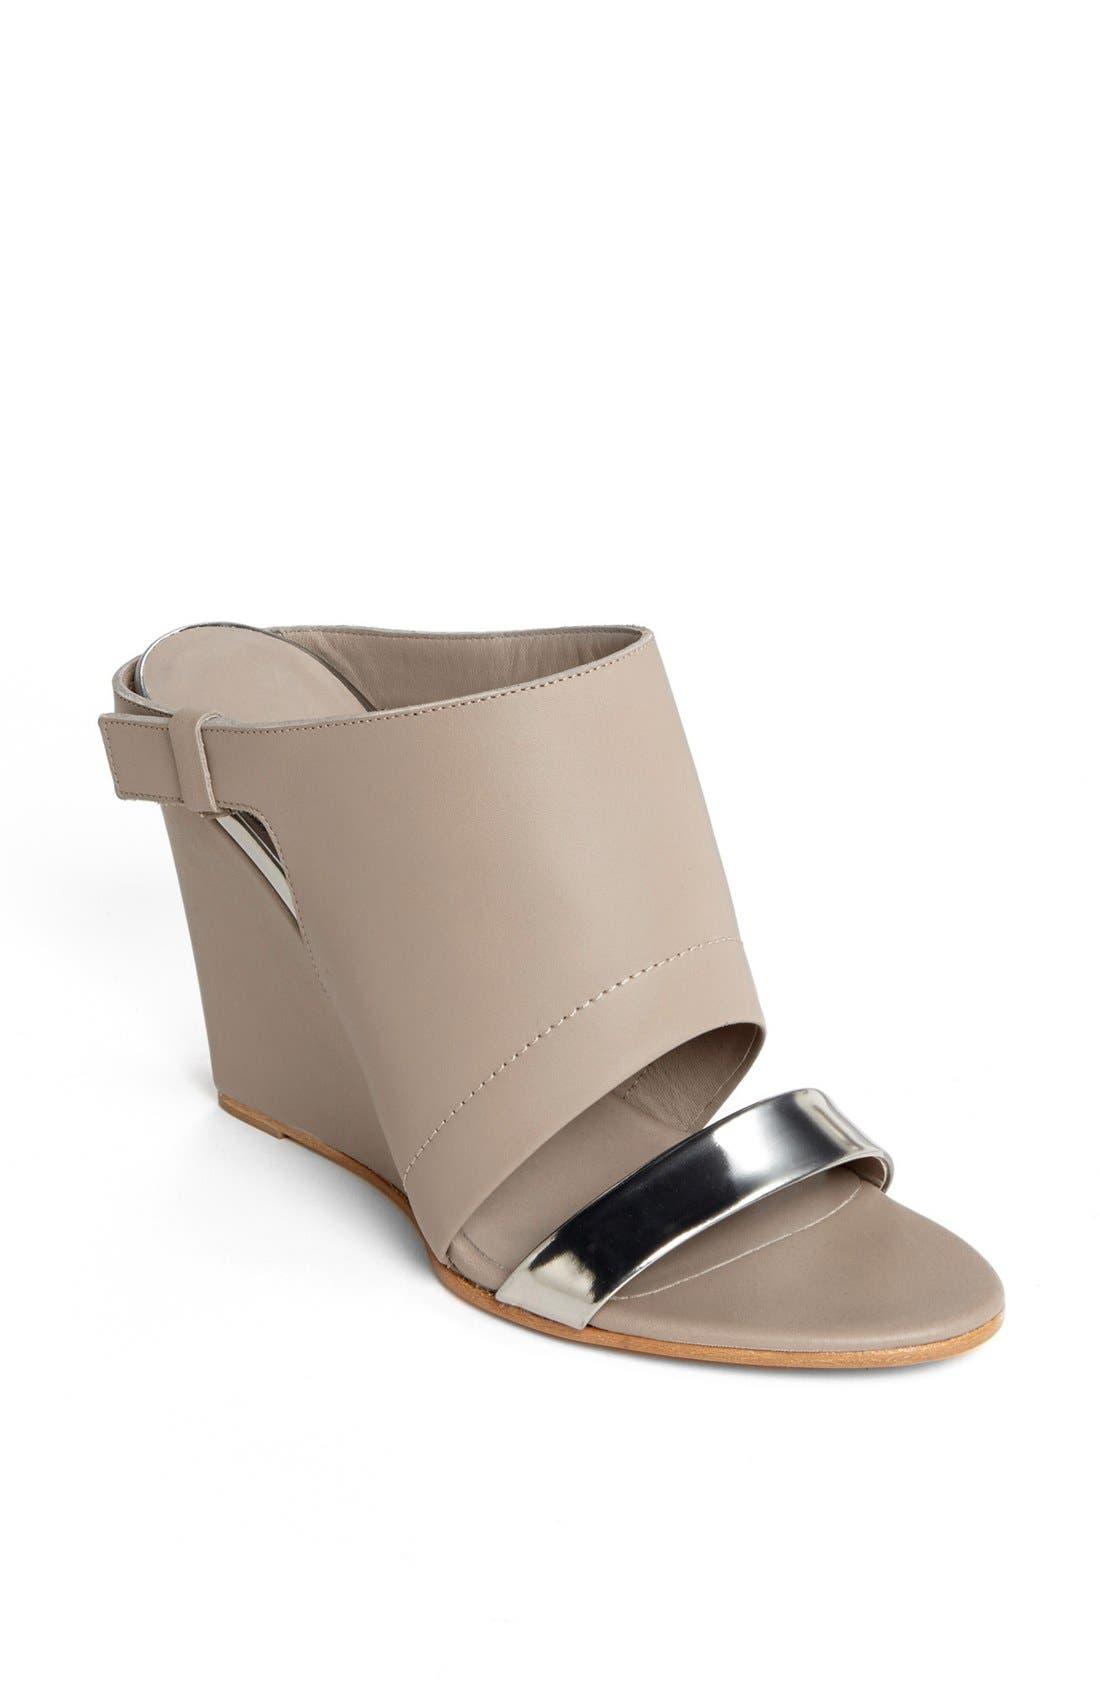 Alternate Image 1 Selected - Vince 'Kasia' Wedge Sandal